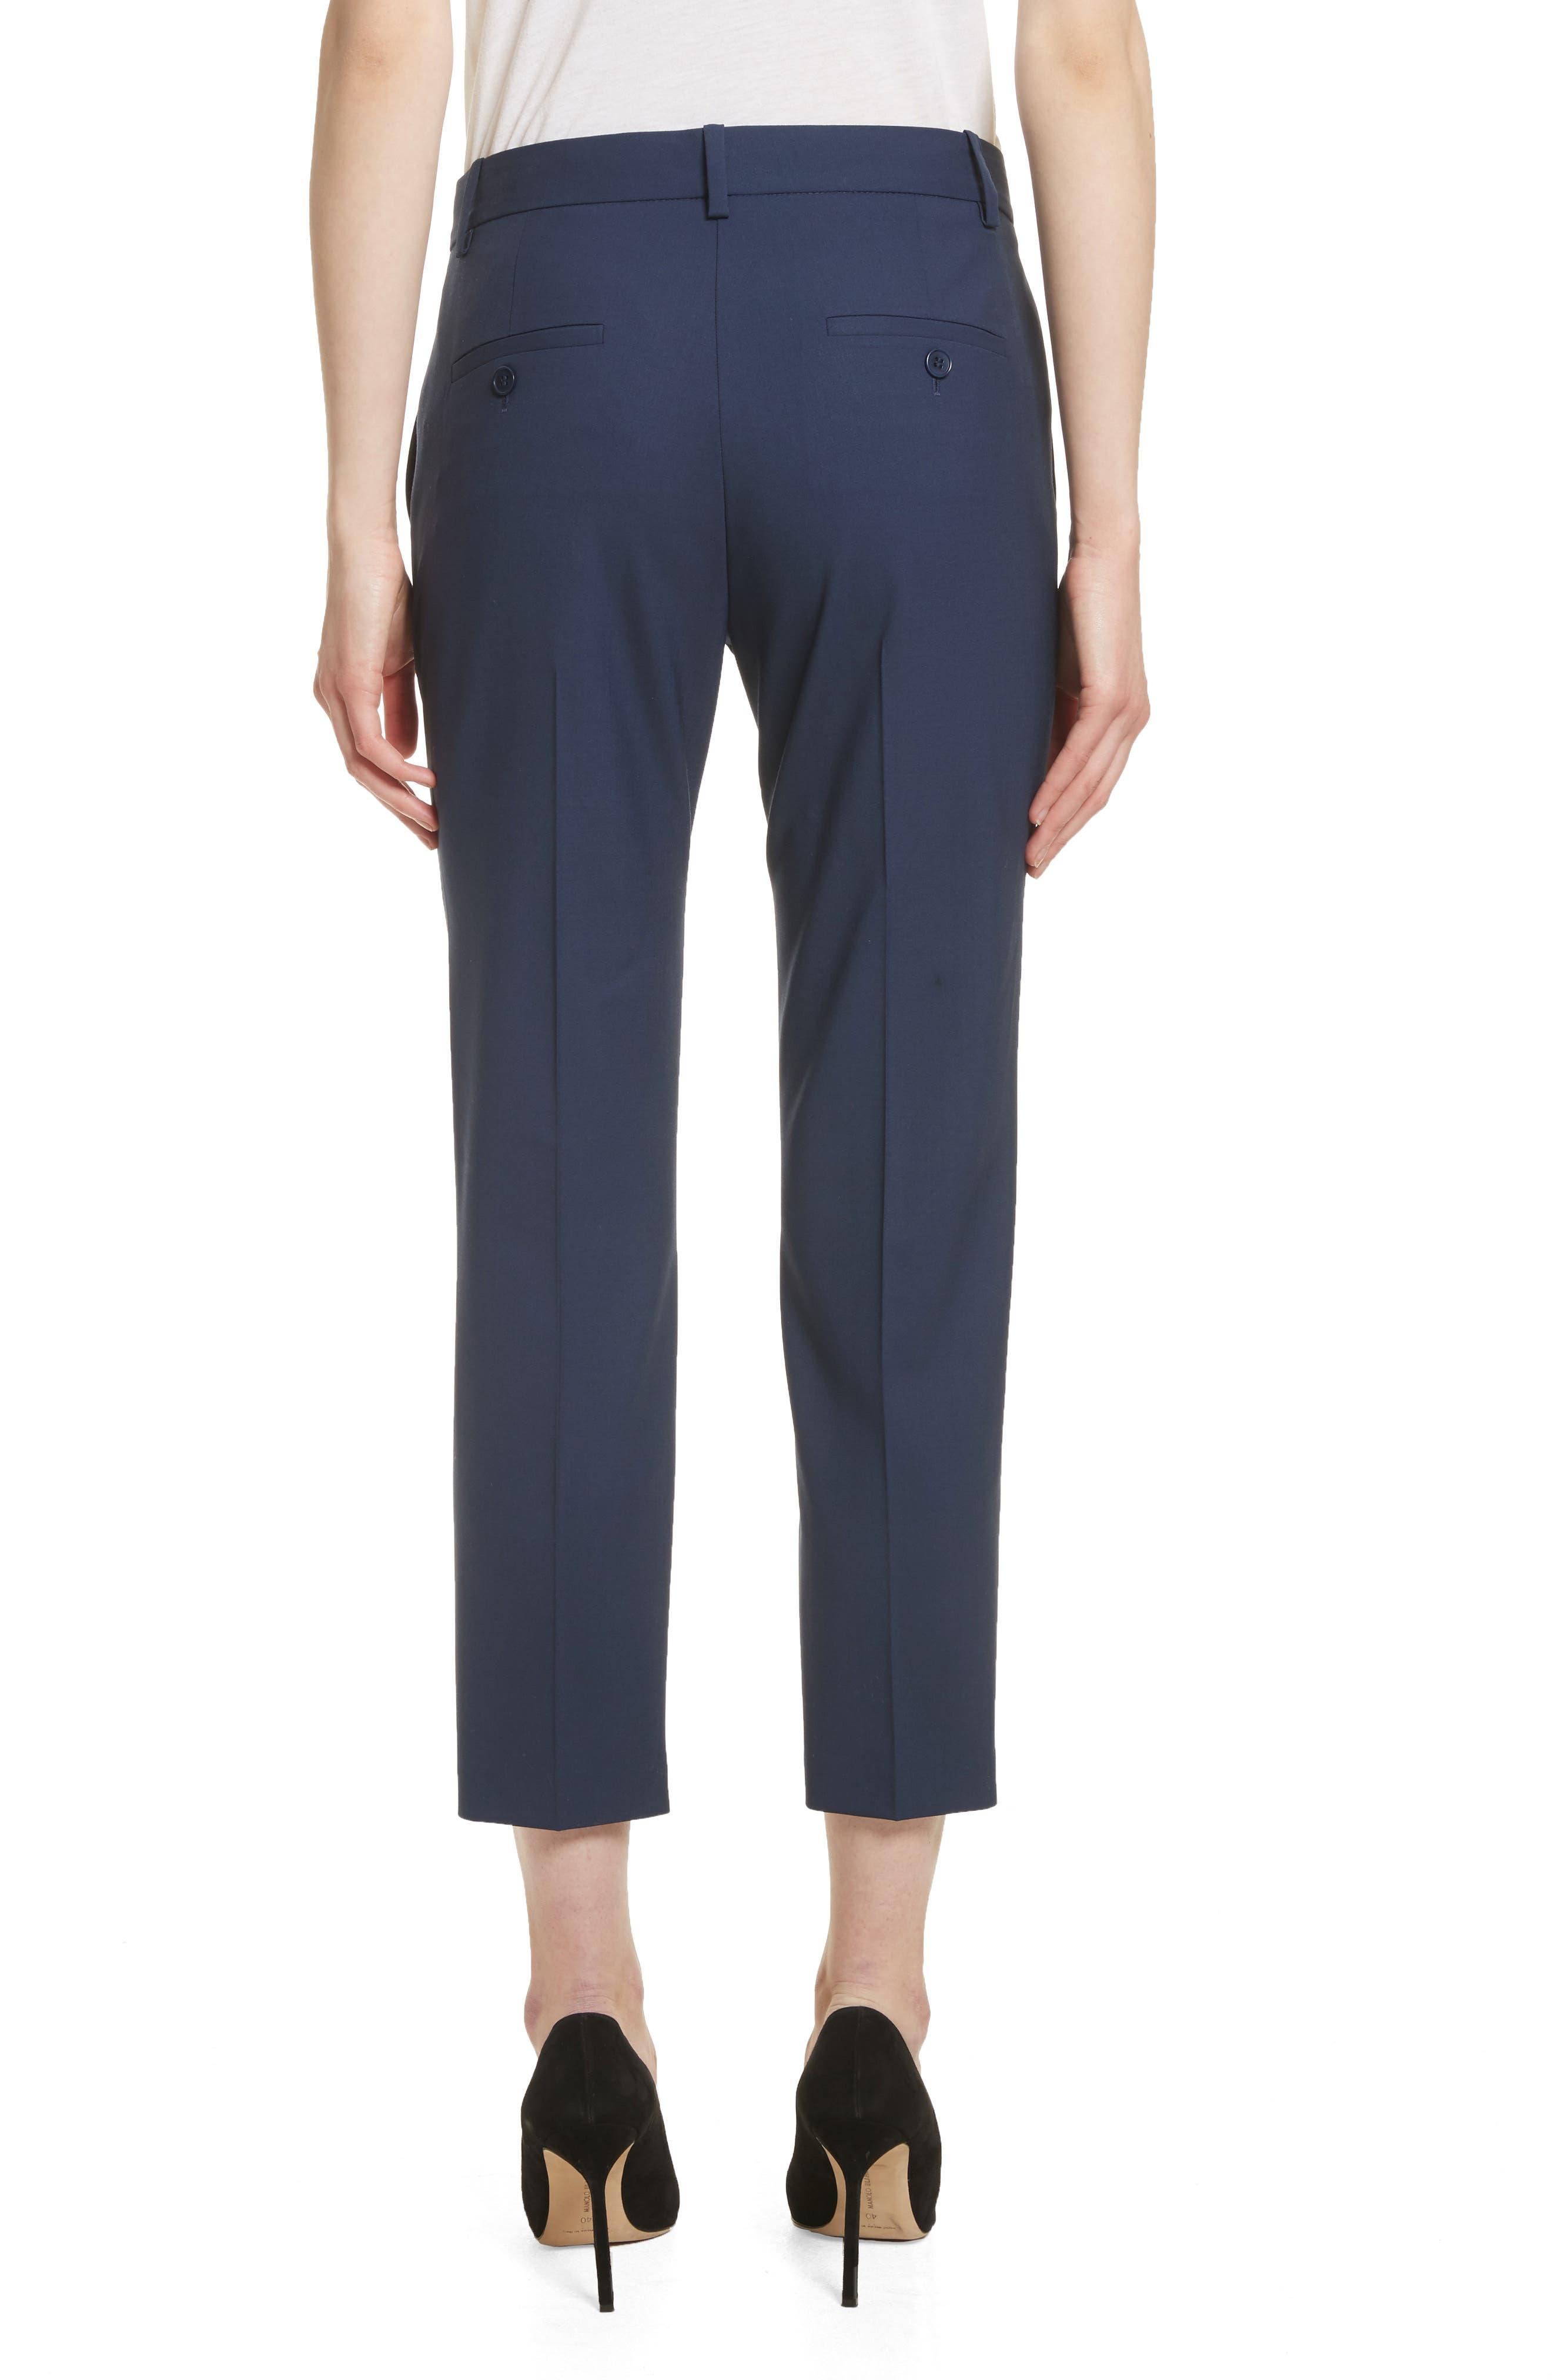 Treeca 2 Good Wool Crop Suit Pants,                             Alternate thumbnail 2, color,                             Sea Blue